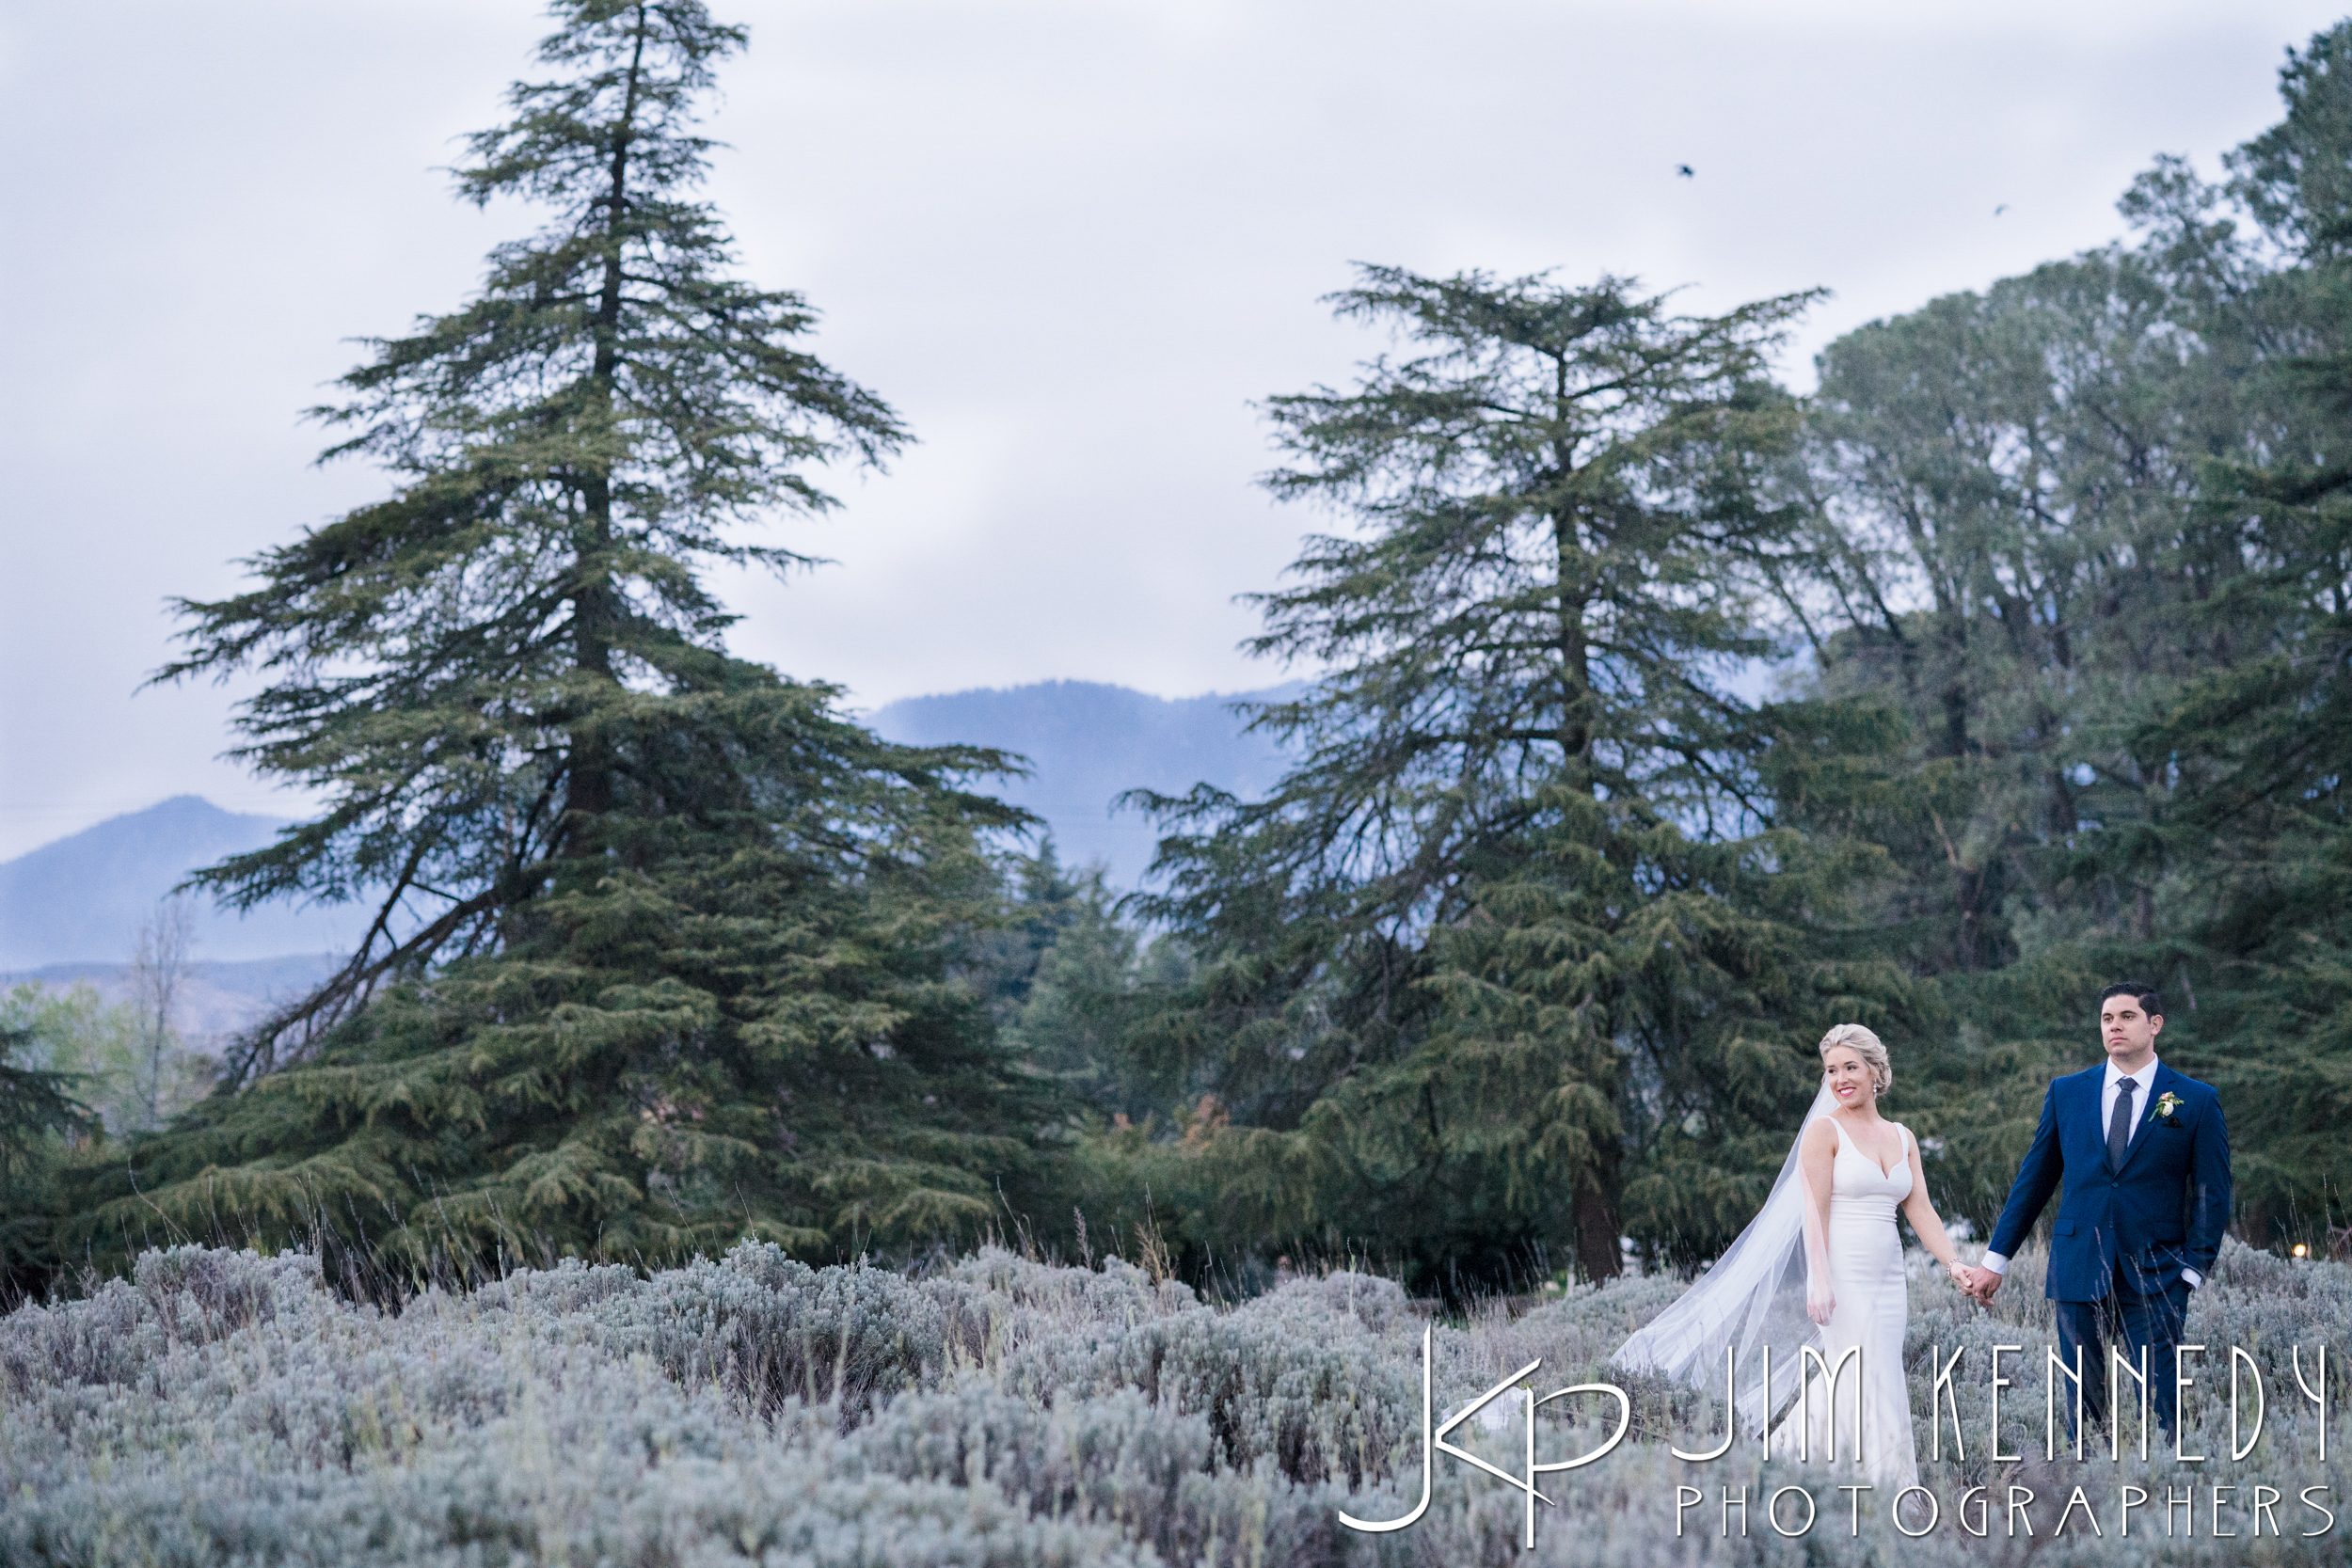 jim_kennedy_photographers_highland_springs_wedding_caitlyn_0159.jpg